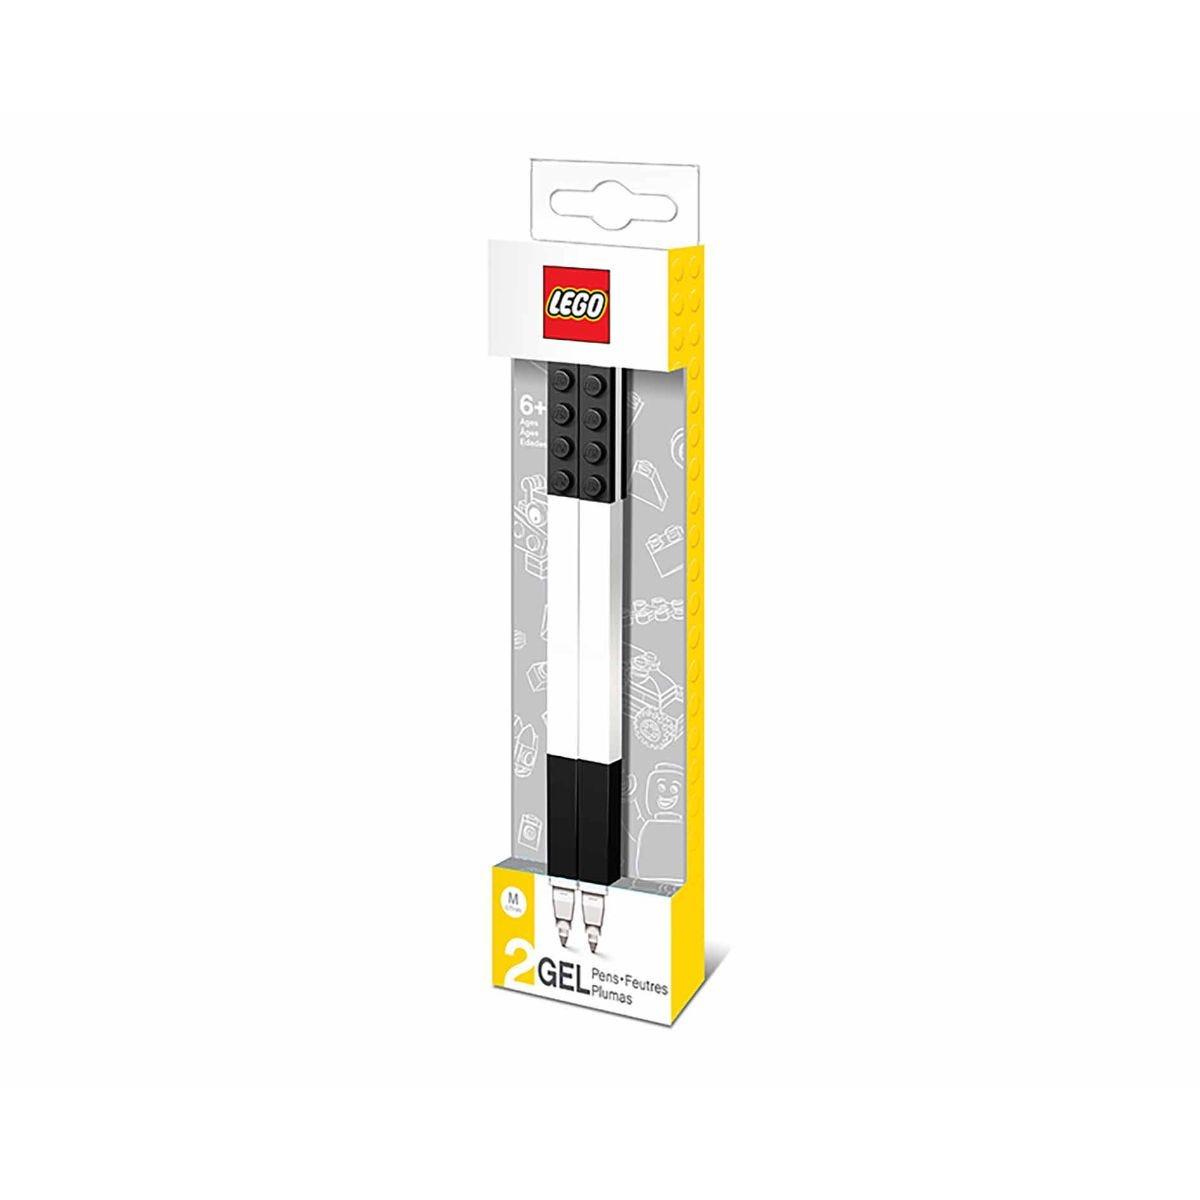 LEGO Gel Pen Pack of 2, Black